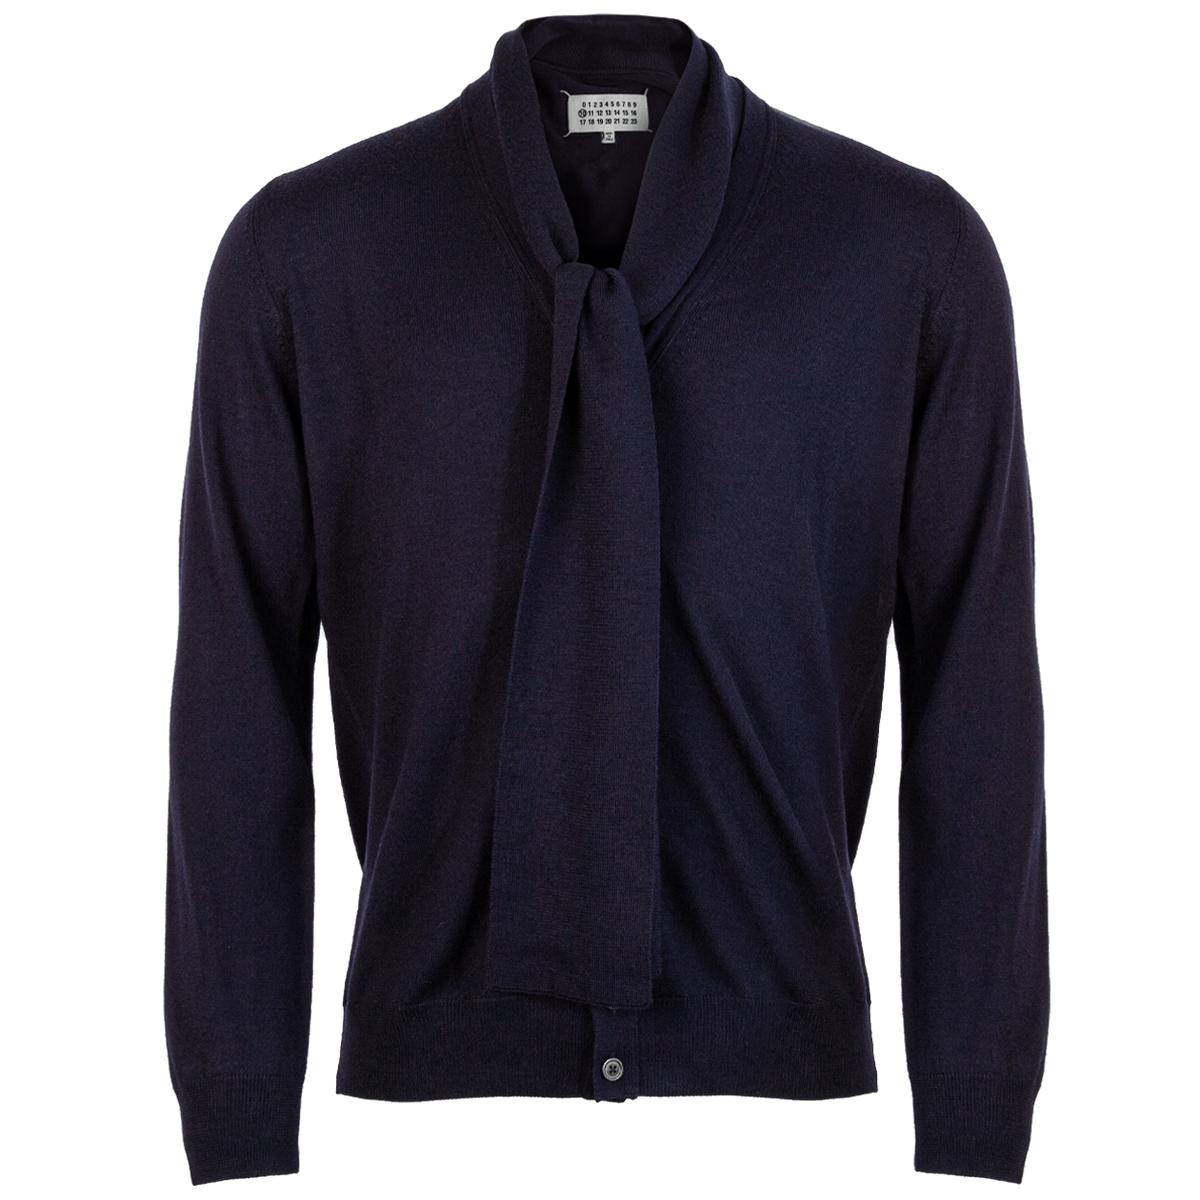 Maison Margiela Tie Detail Fine Knit Cardigan Navy | Hervia